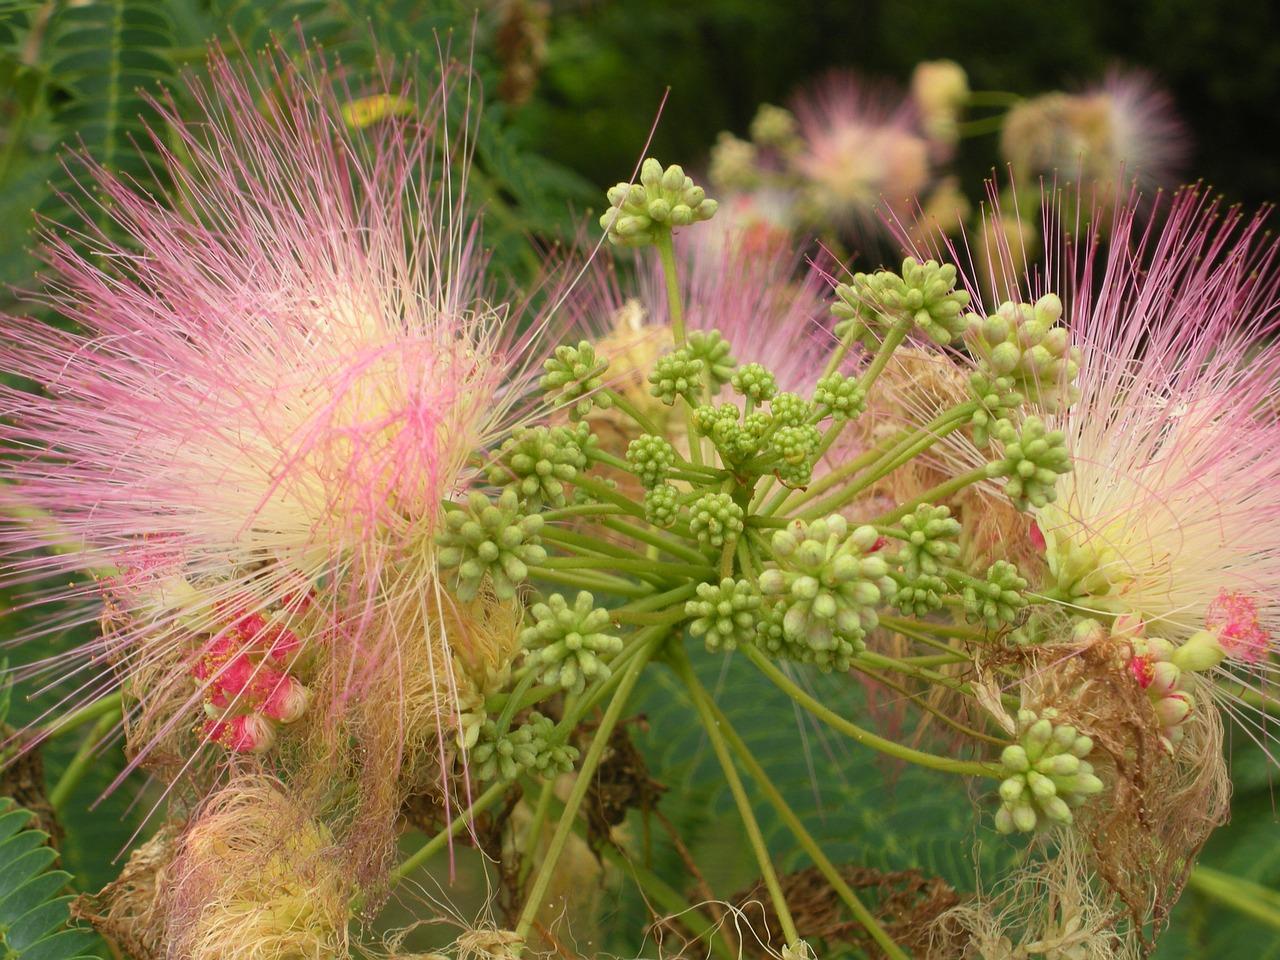 Flowerssilk Tree Flowertotal Restitution Free Photo From Needpix